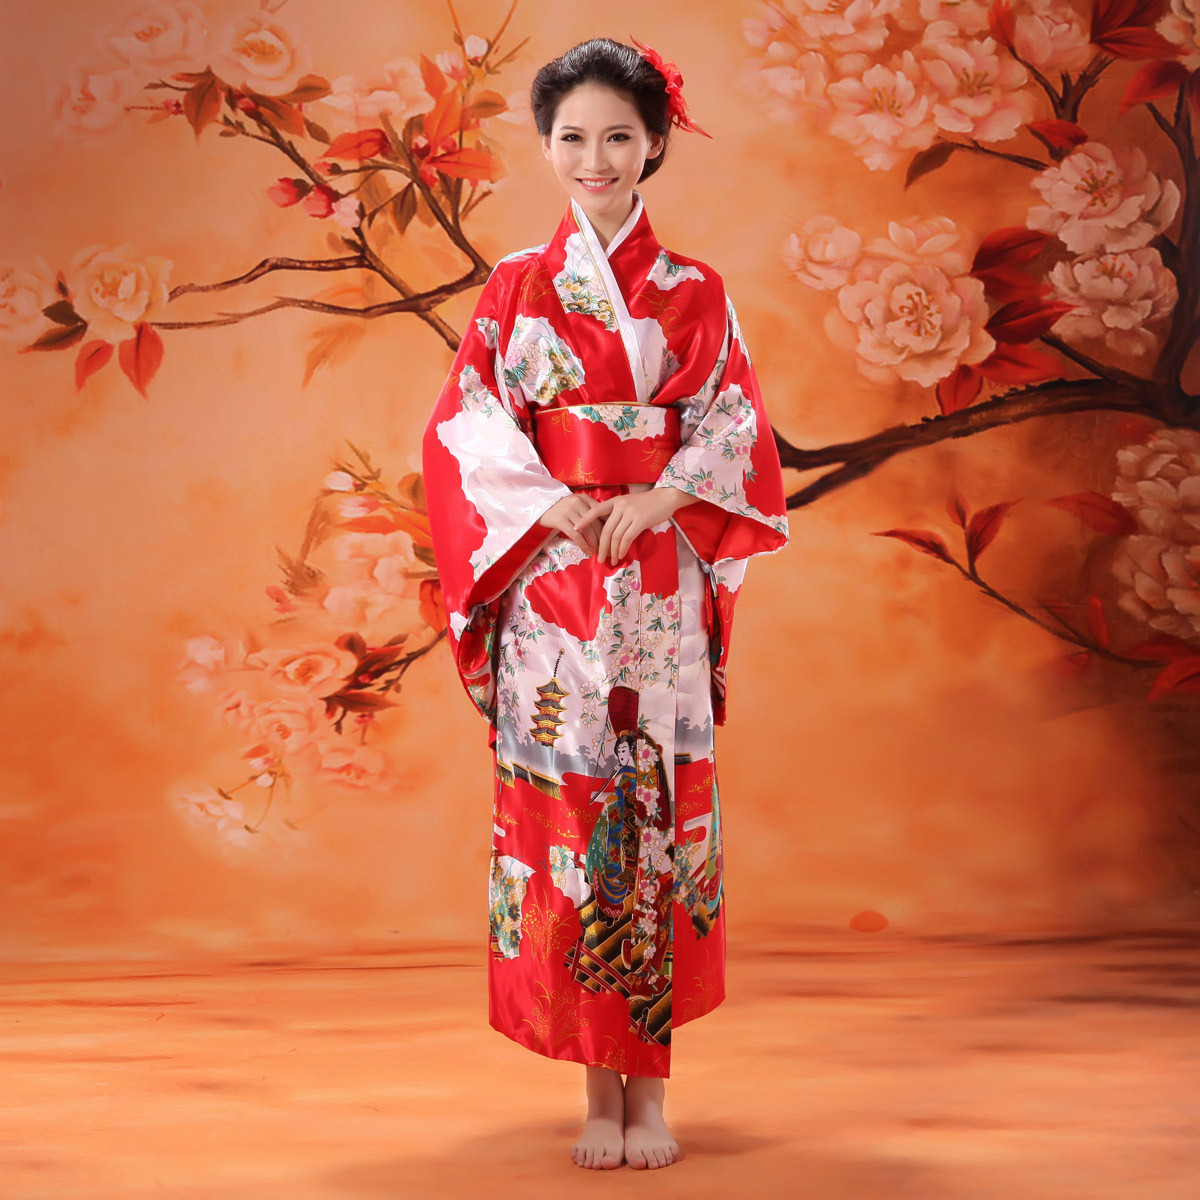 Japanese traditional kimono dress The ancient Japanese ...